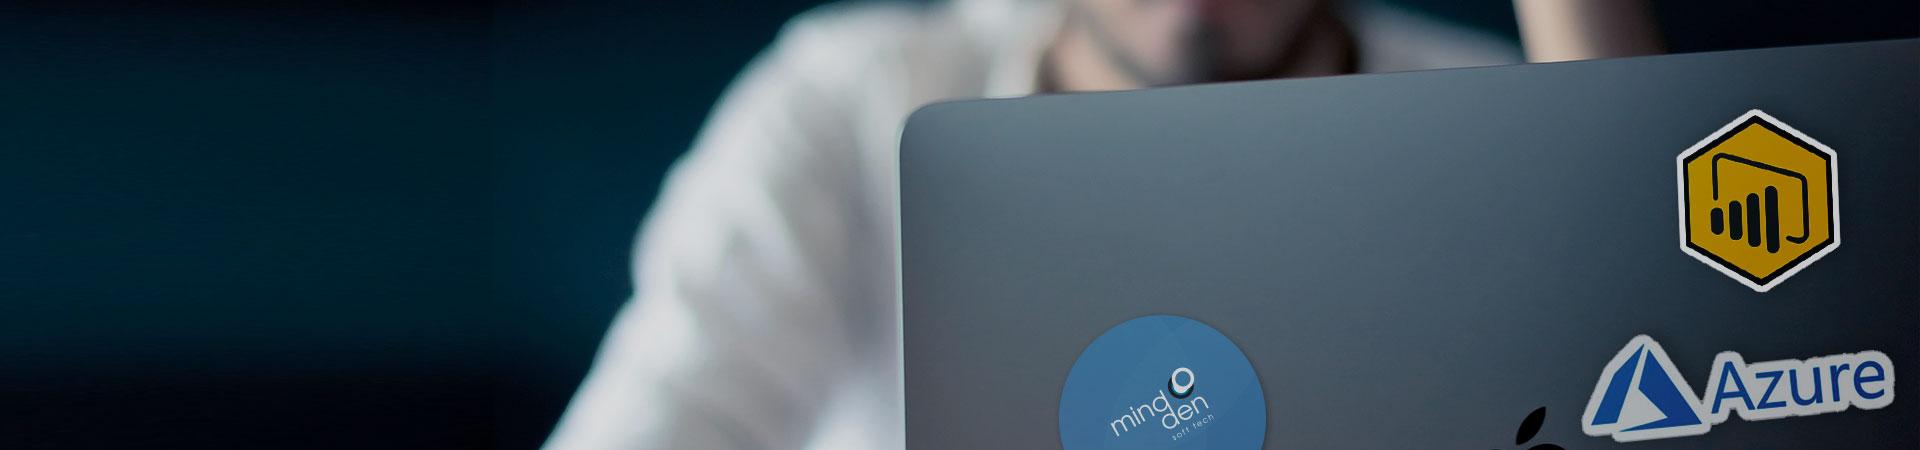 Power BI y Azure Analytics revelan resultados sorprendentes